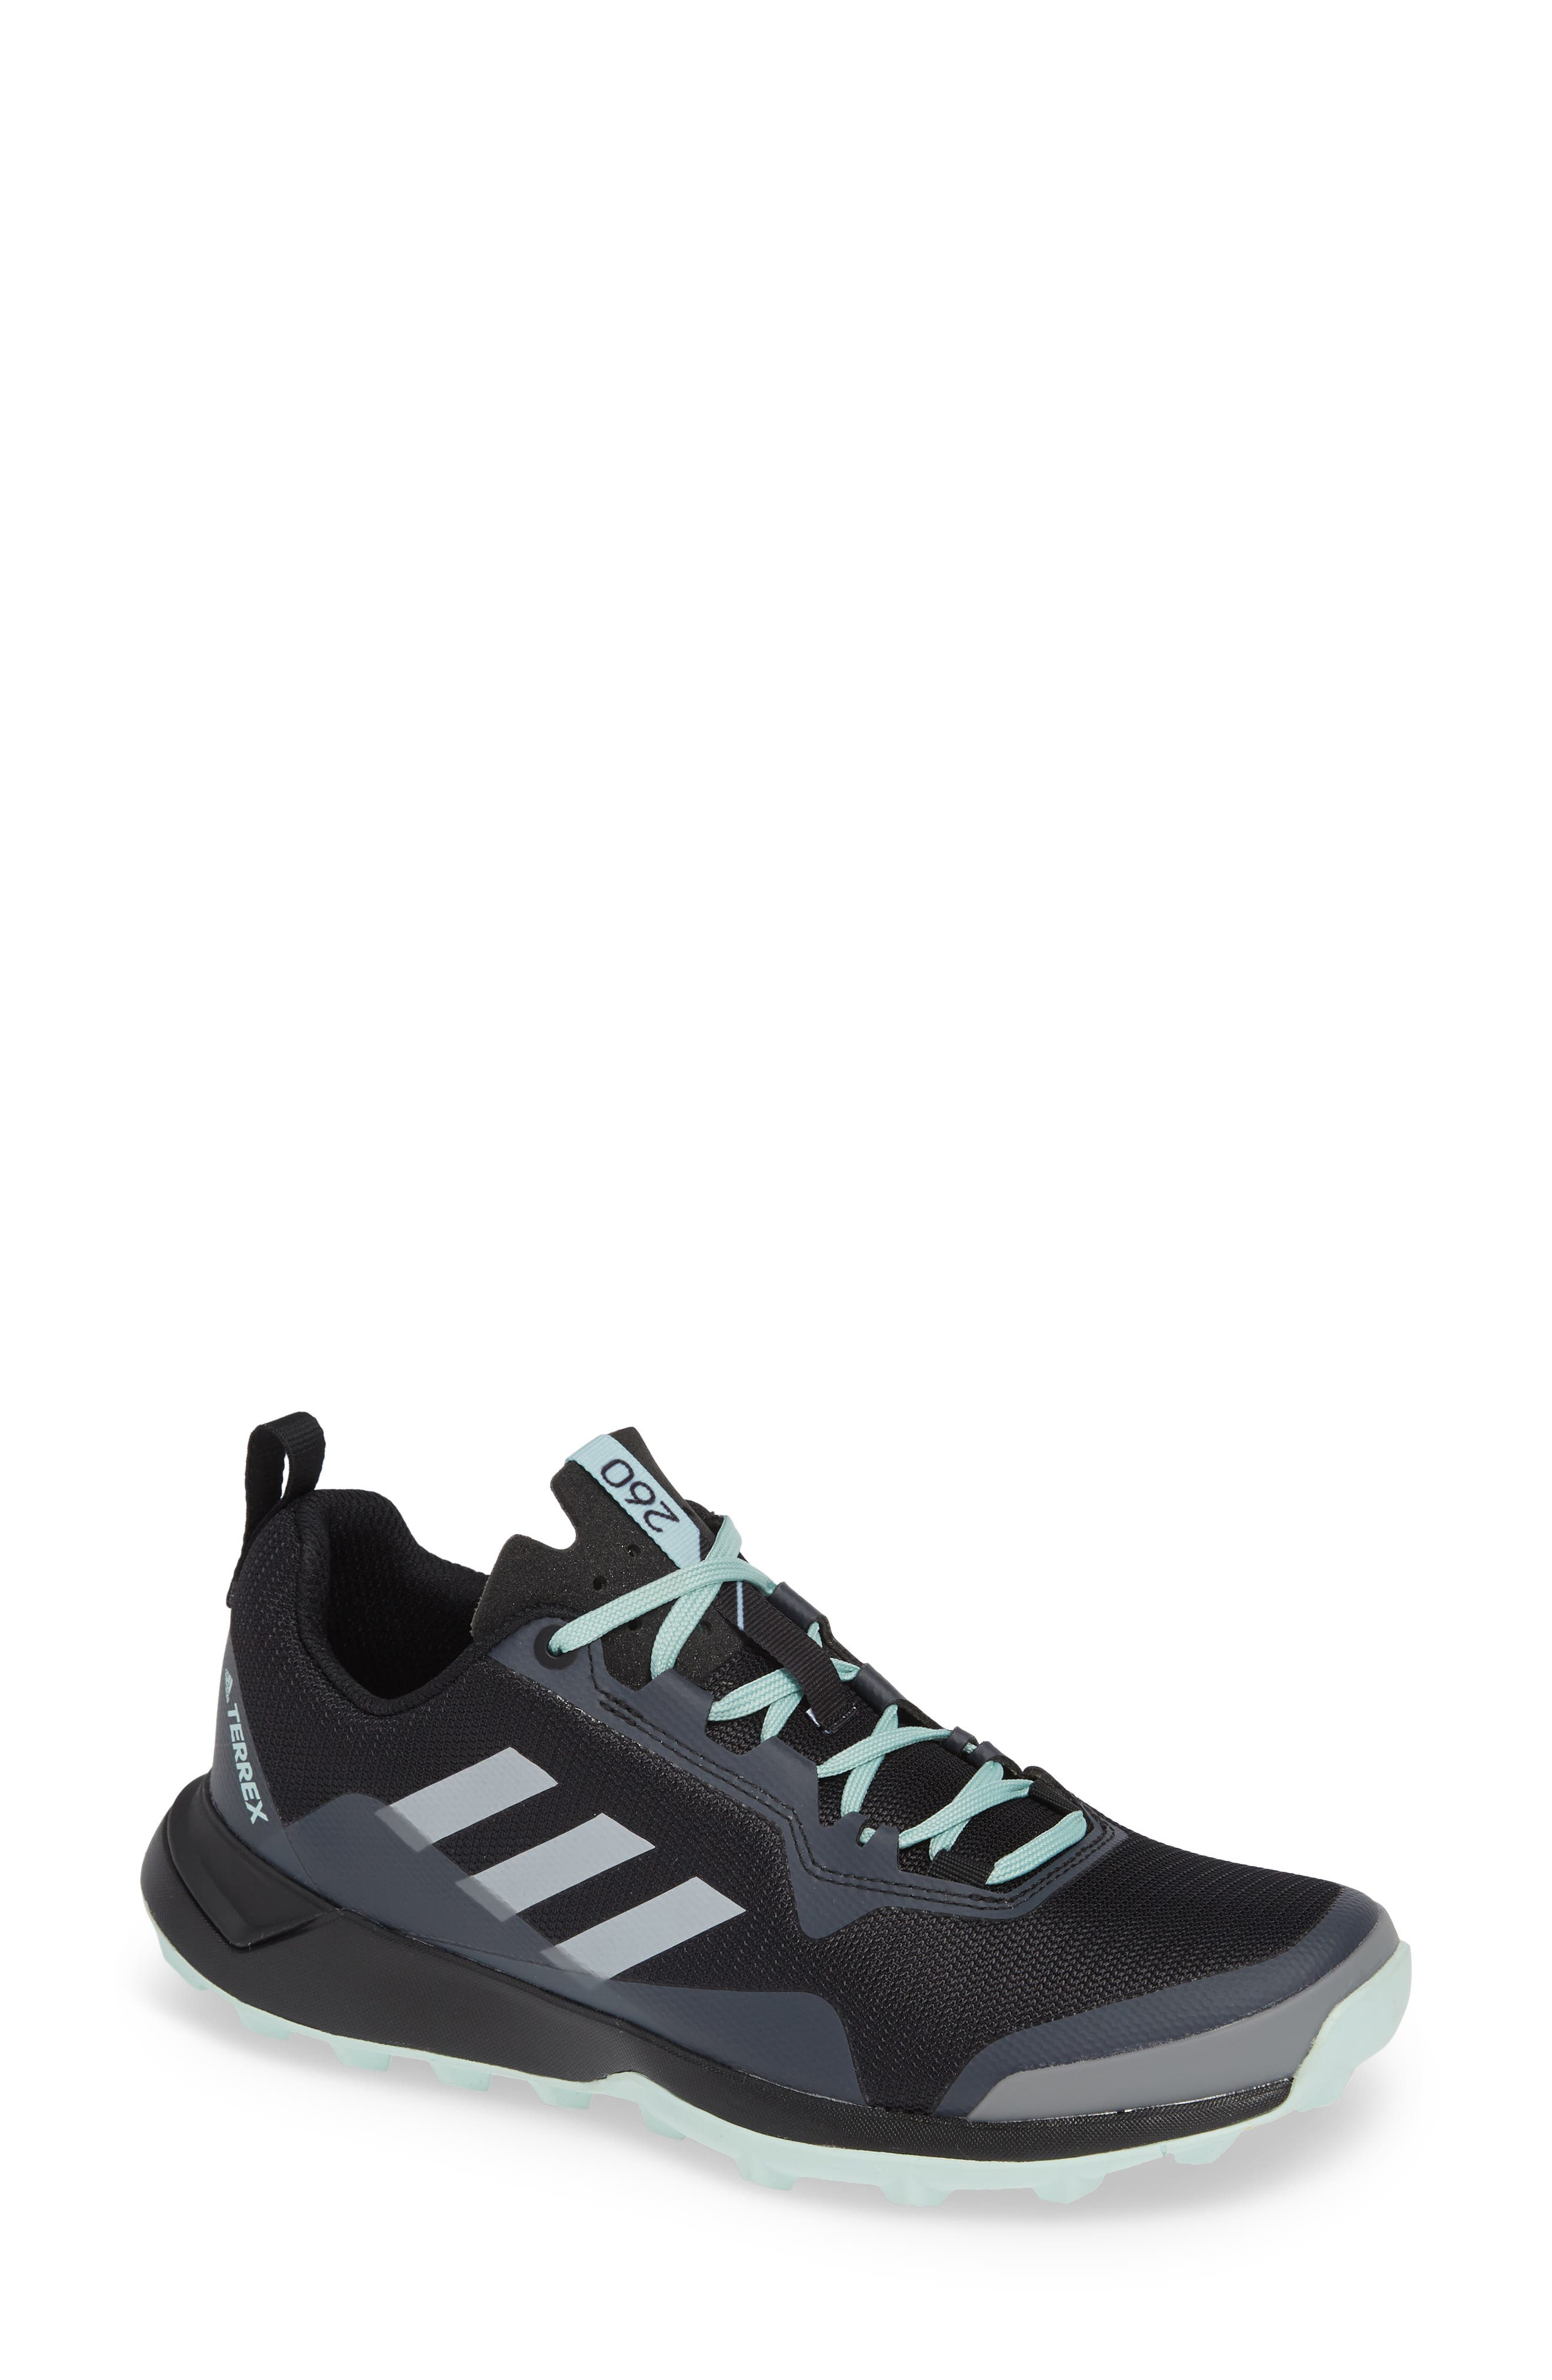 Terrex CMTK Gore-Tex<sup>®</sup> Waterproof Hiking Sneaker,                         Main,                         color, BLACK/ CHALK WHITE/ ASH GREEN